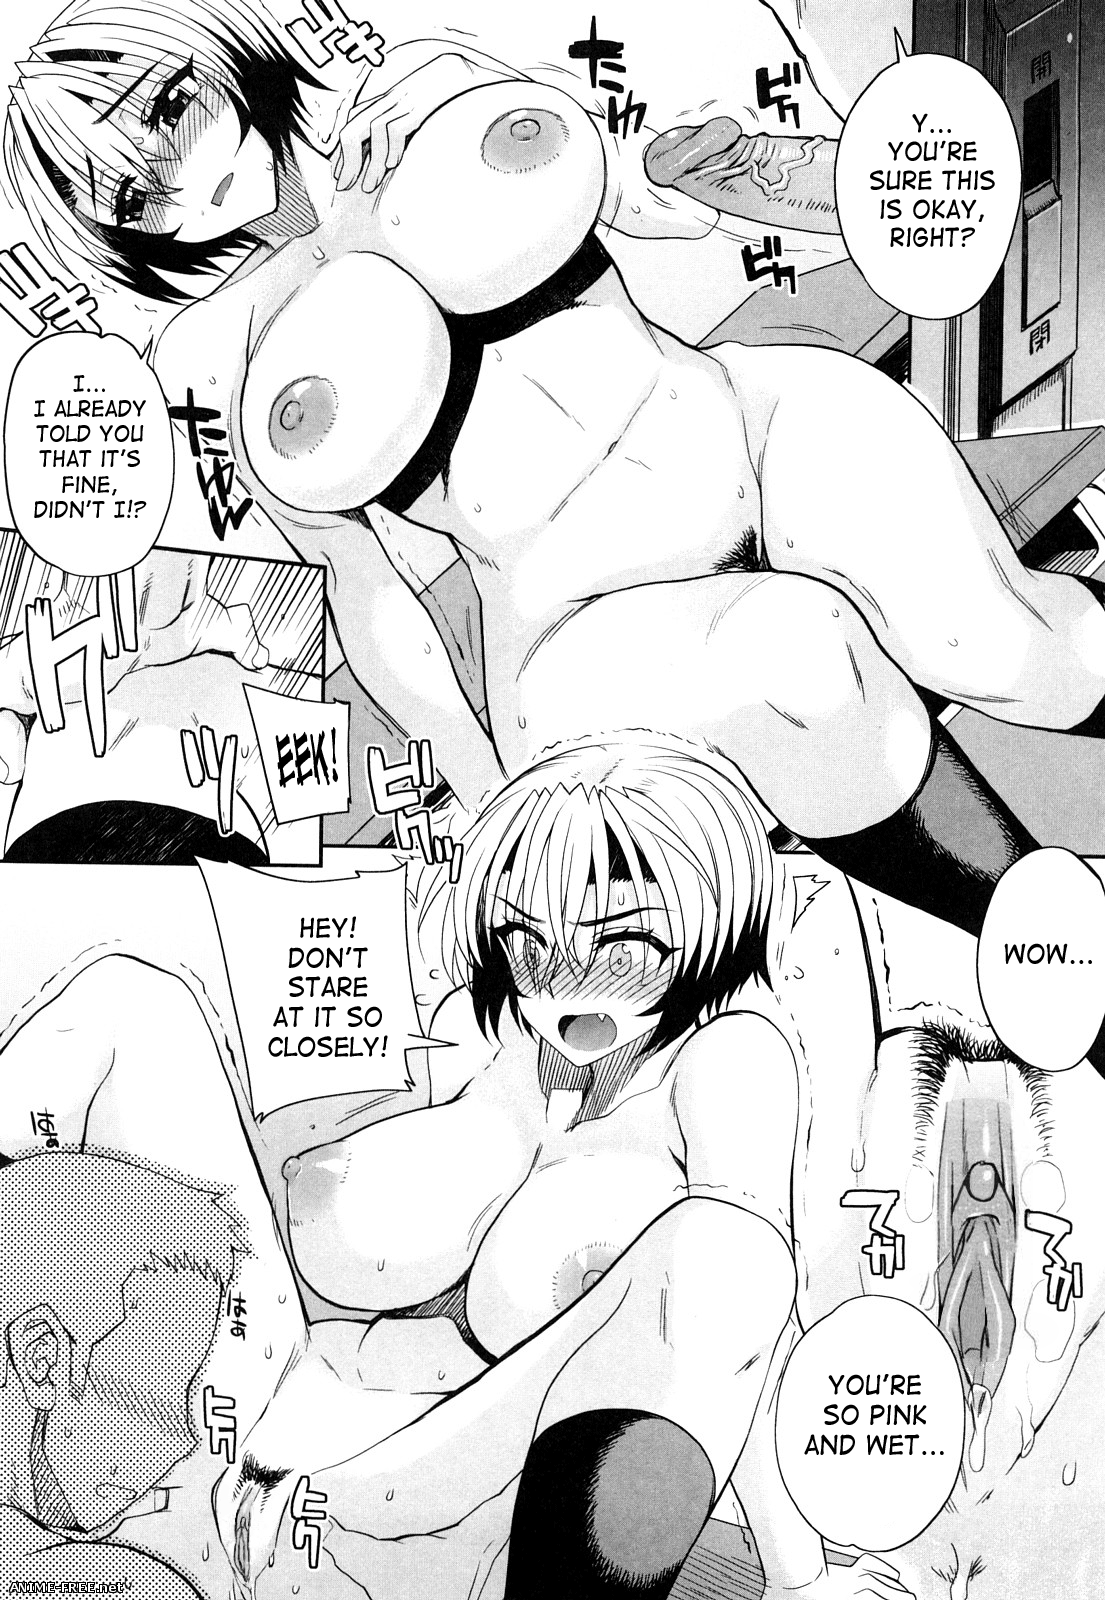 Carn / Magono-Tei / Magonotei - Сборник работ [Ptcen] [RUS,JAP,ENG,CHI] Manga Hentai